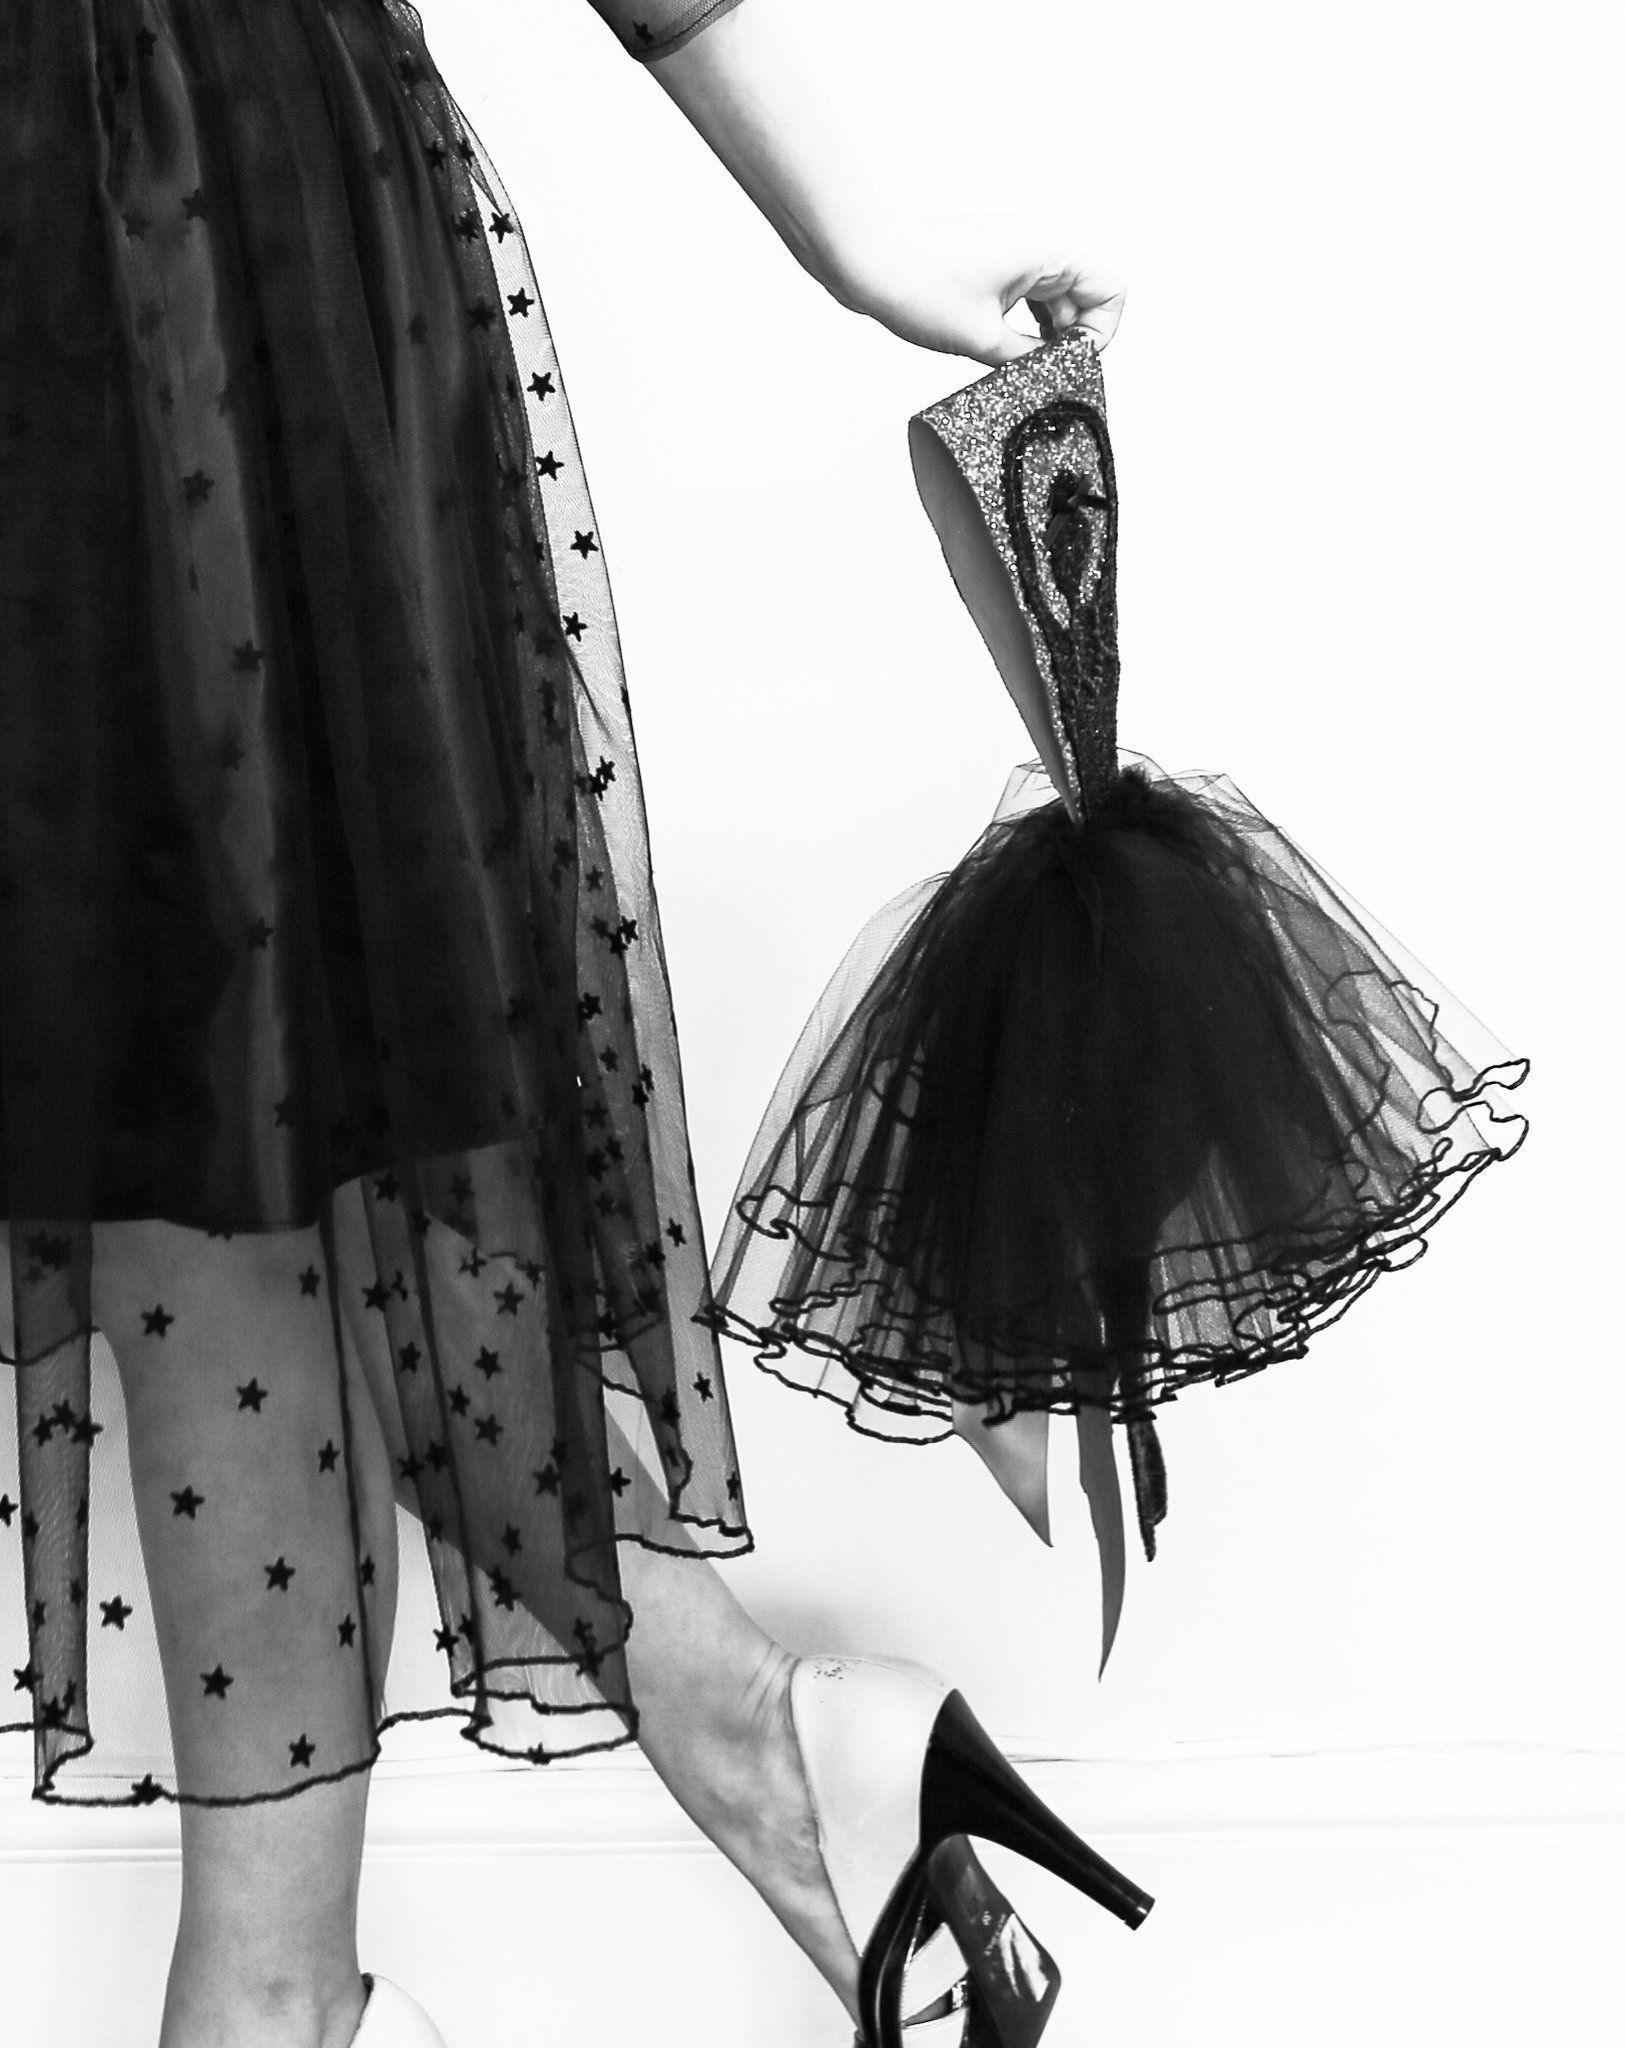 530d644aa6 Bag - Ballerina Red Sidekick Cocktail Purse | Alexandra King ...